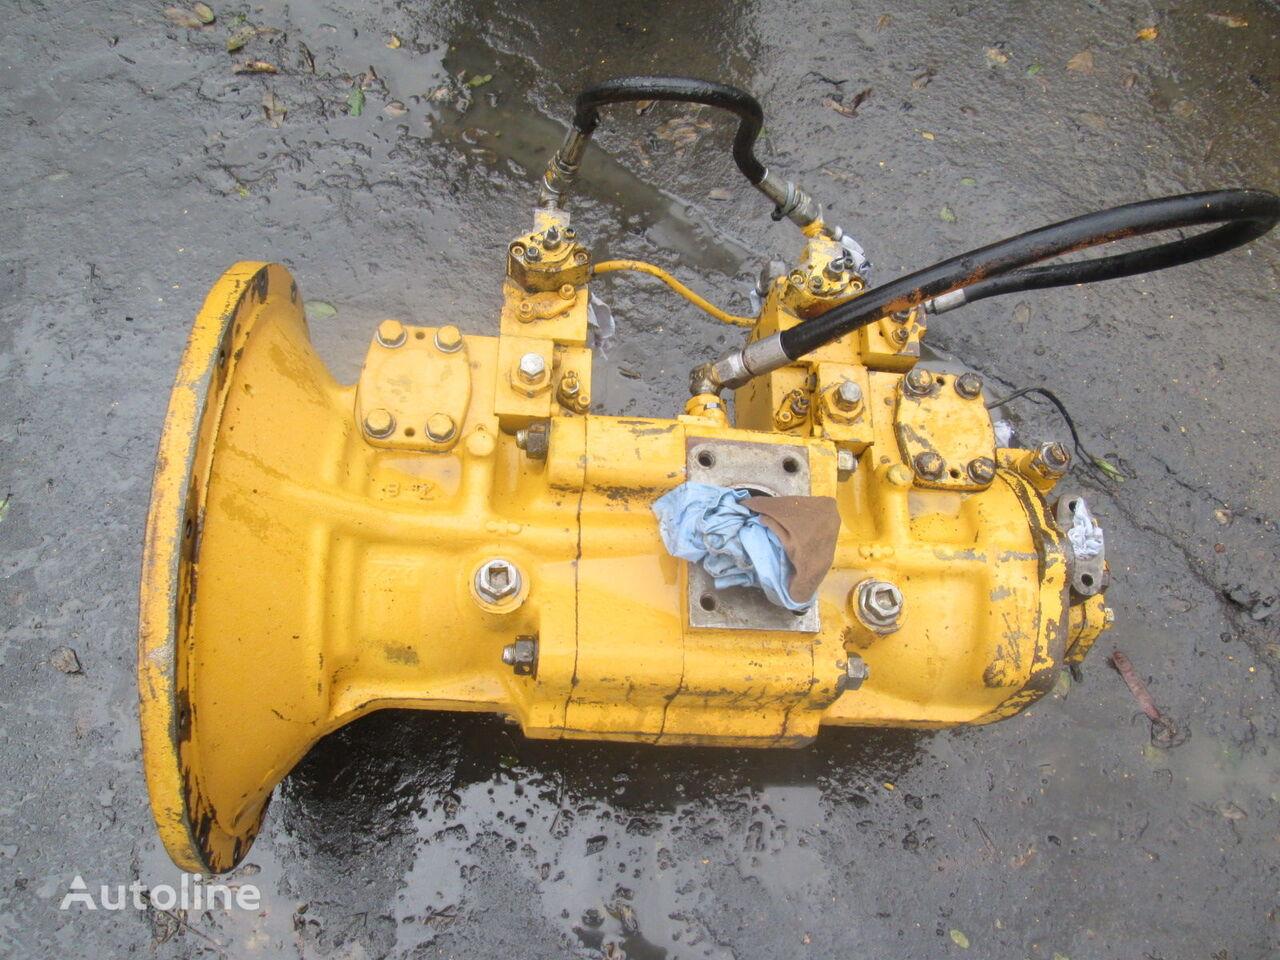 pompa hidraulik untuk excavator KOMATSU PC240